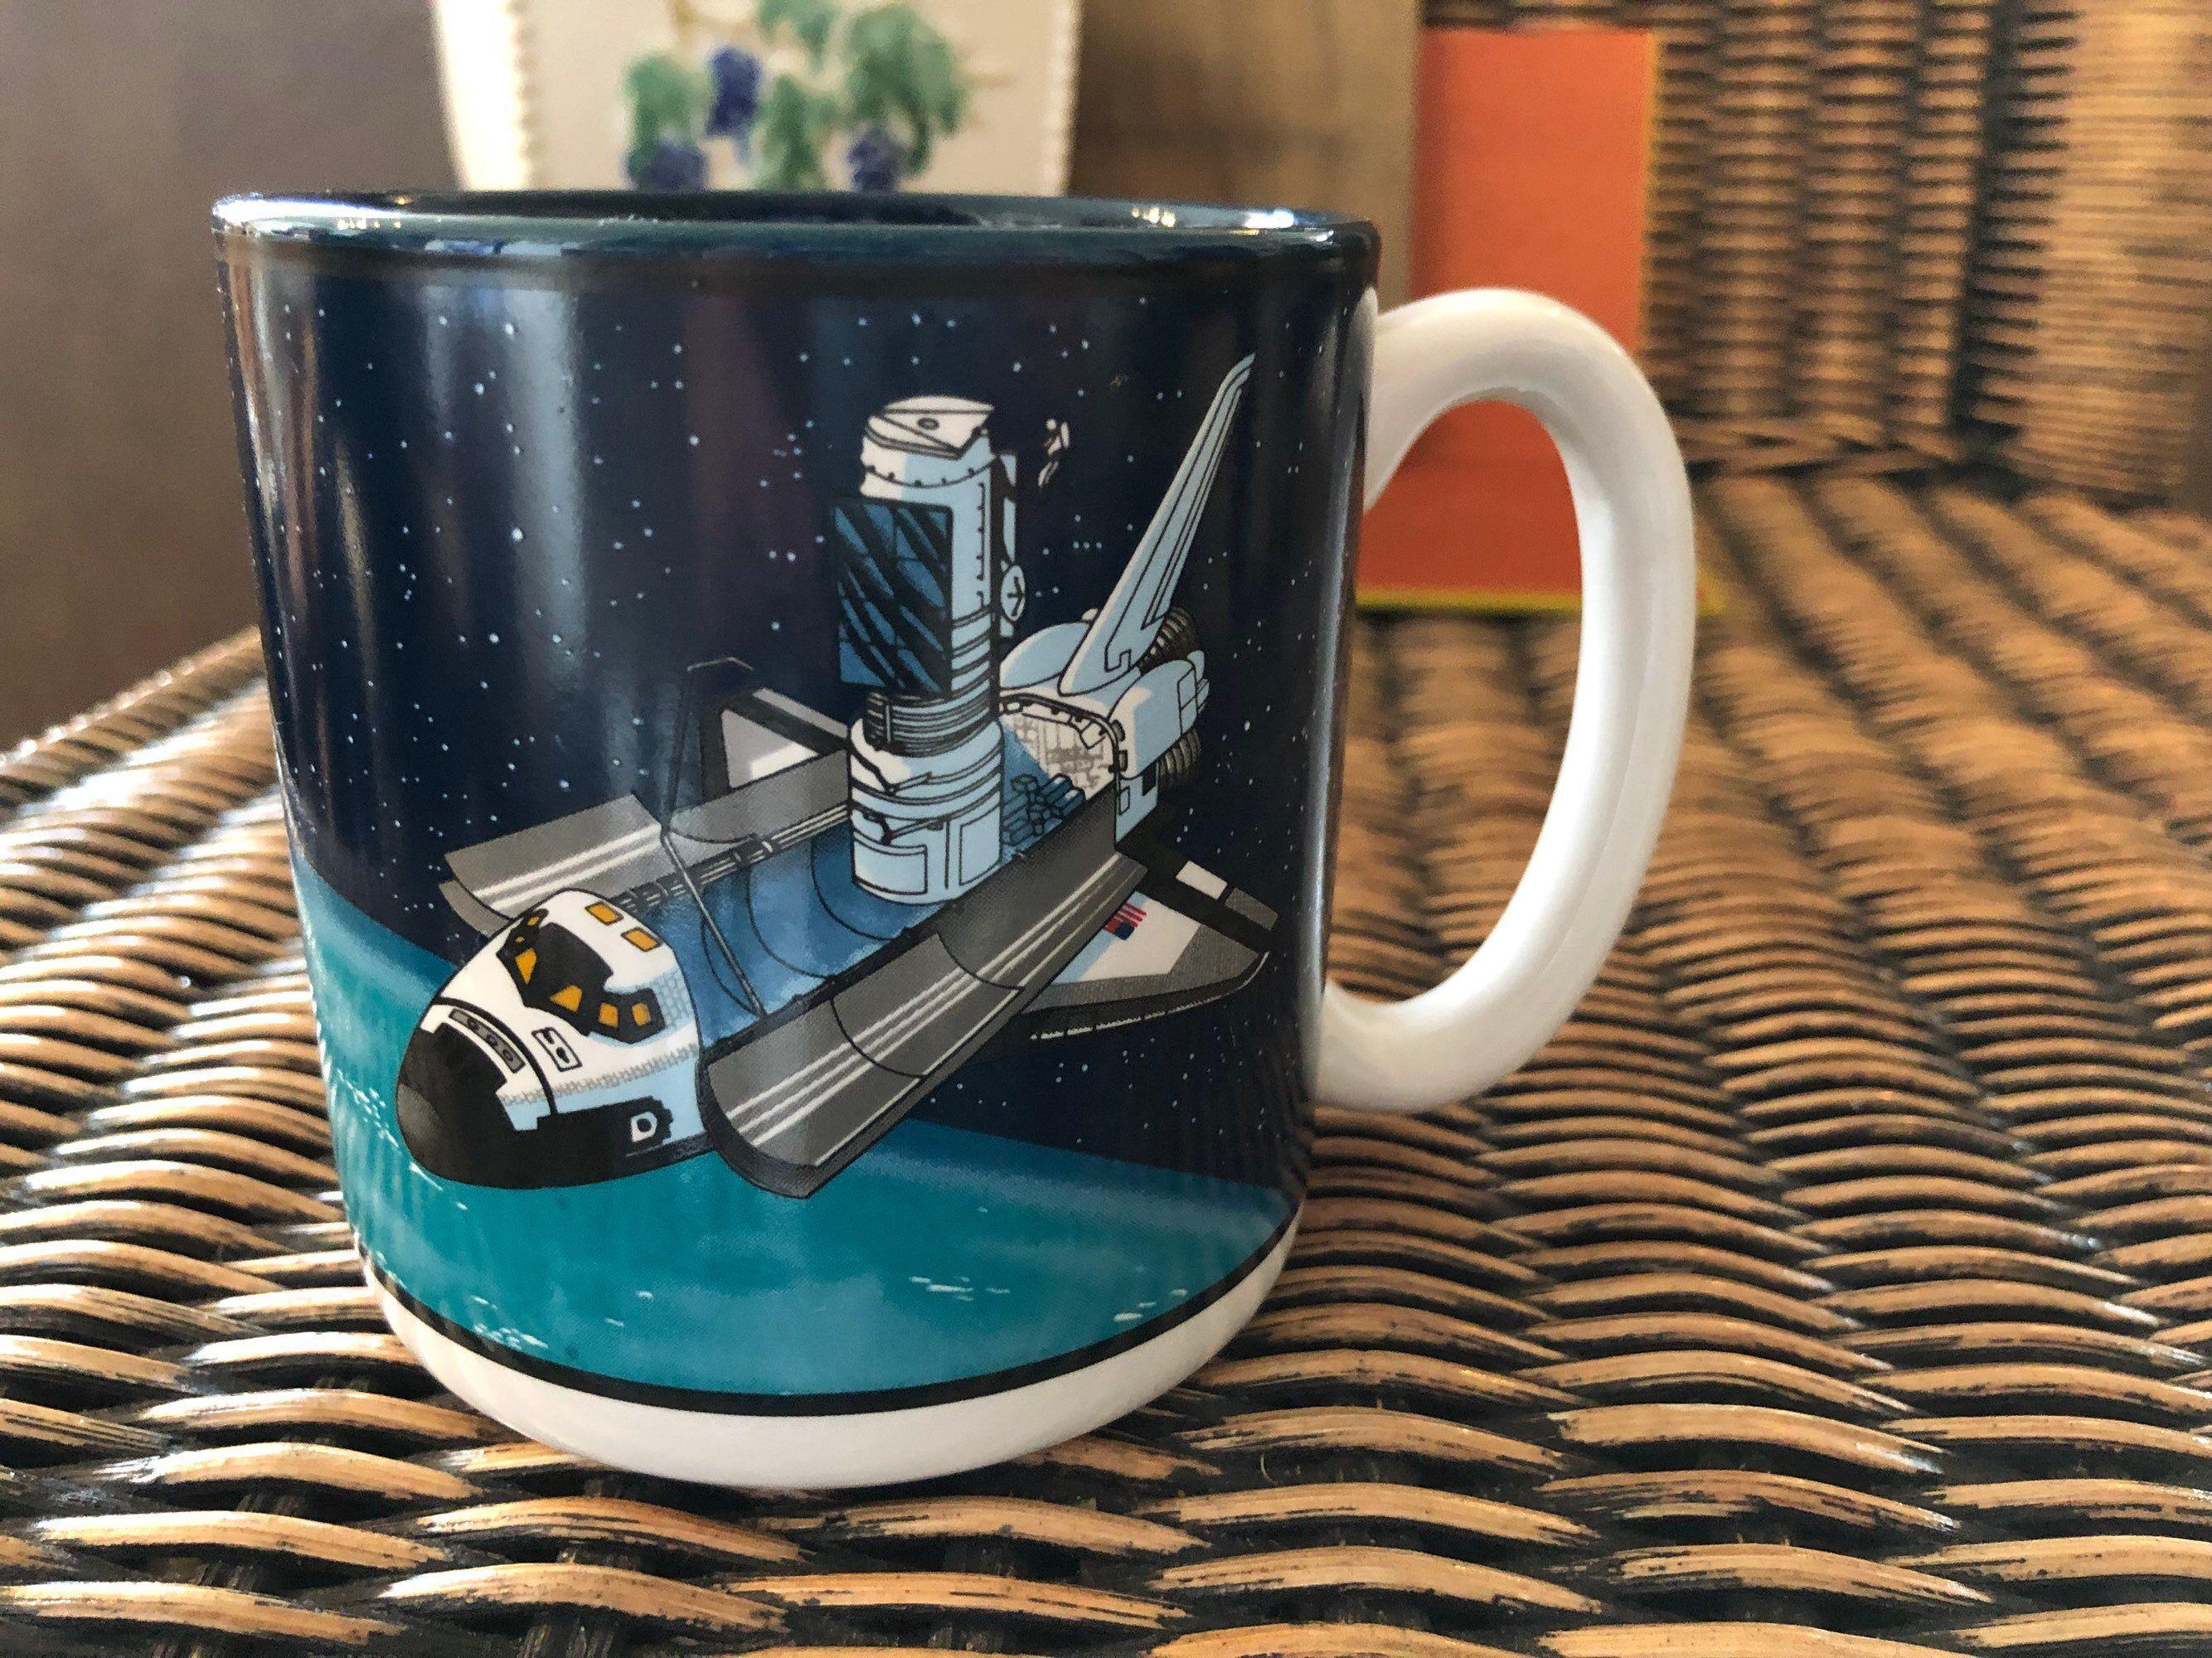 Etsy Shop Vintage Outerspace Shuttle Spaceshuttle